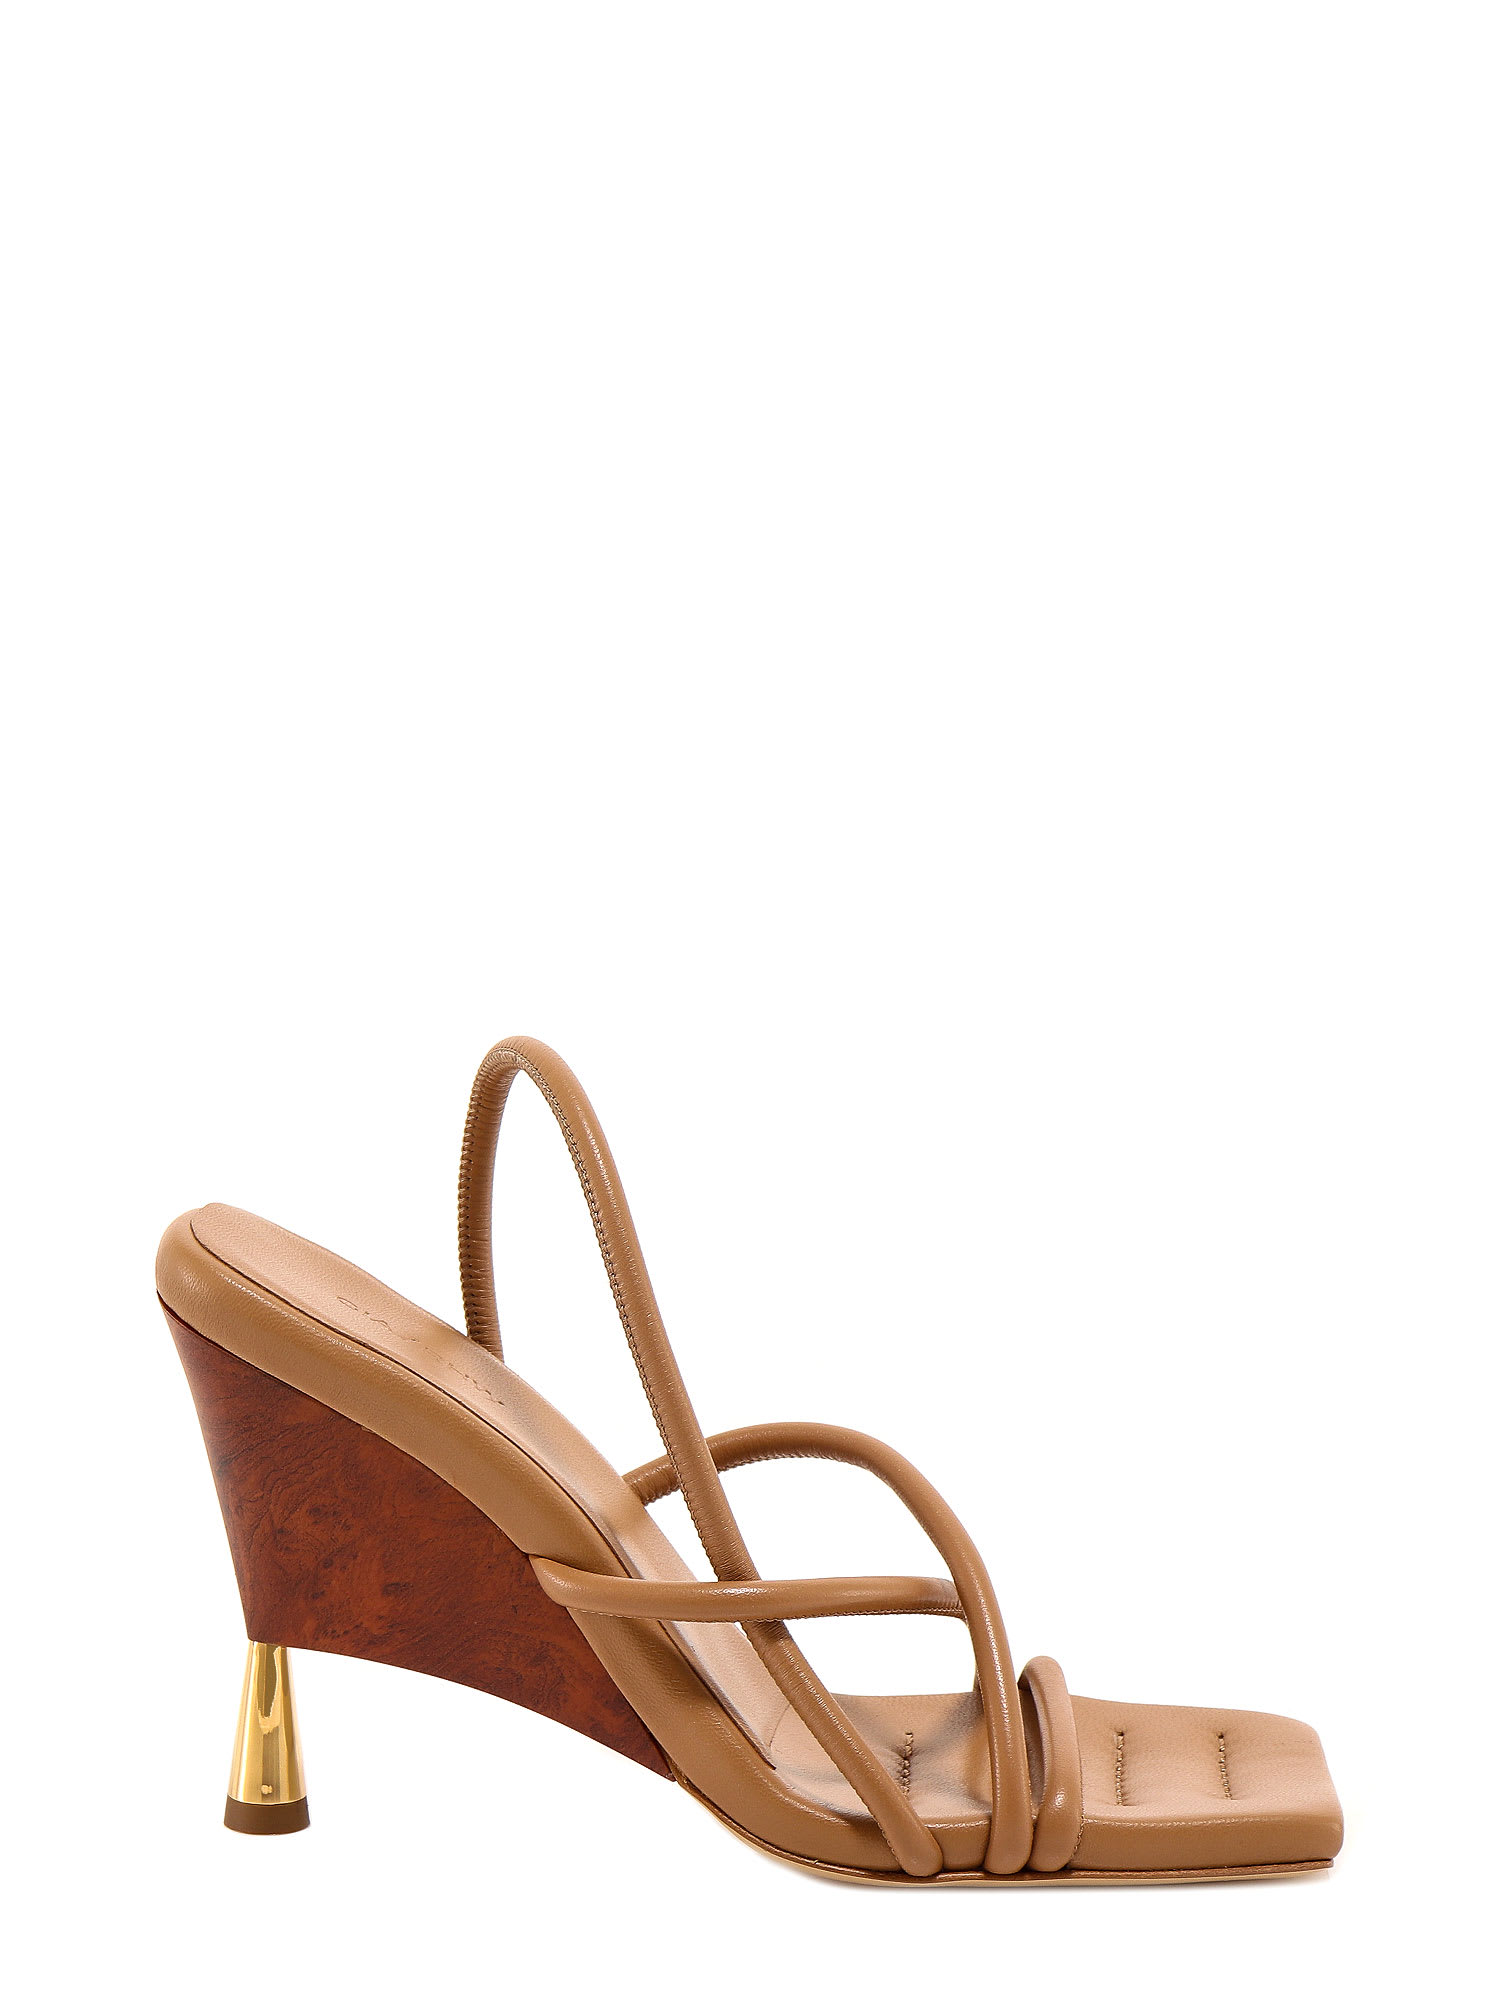 Gia X Rhw Rosie 2 Sandal